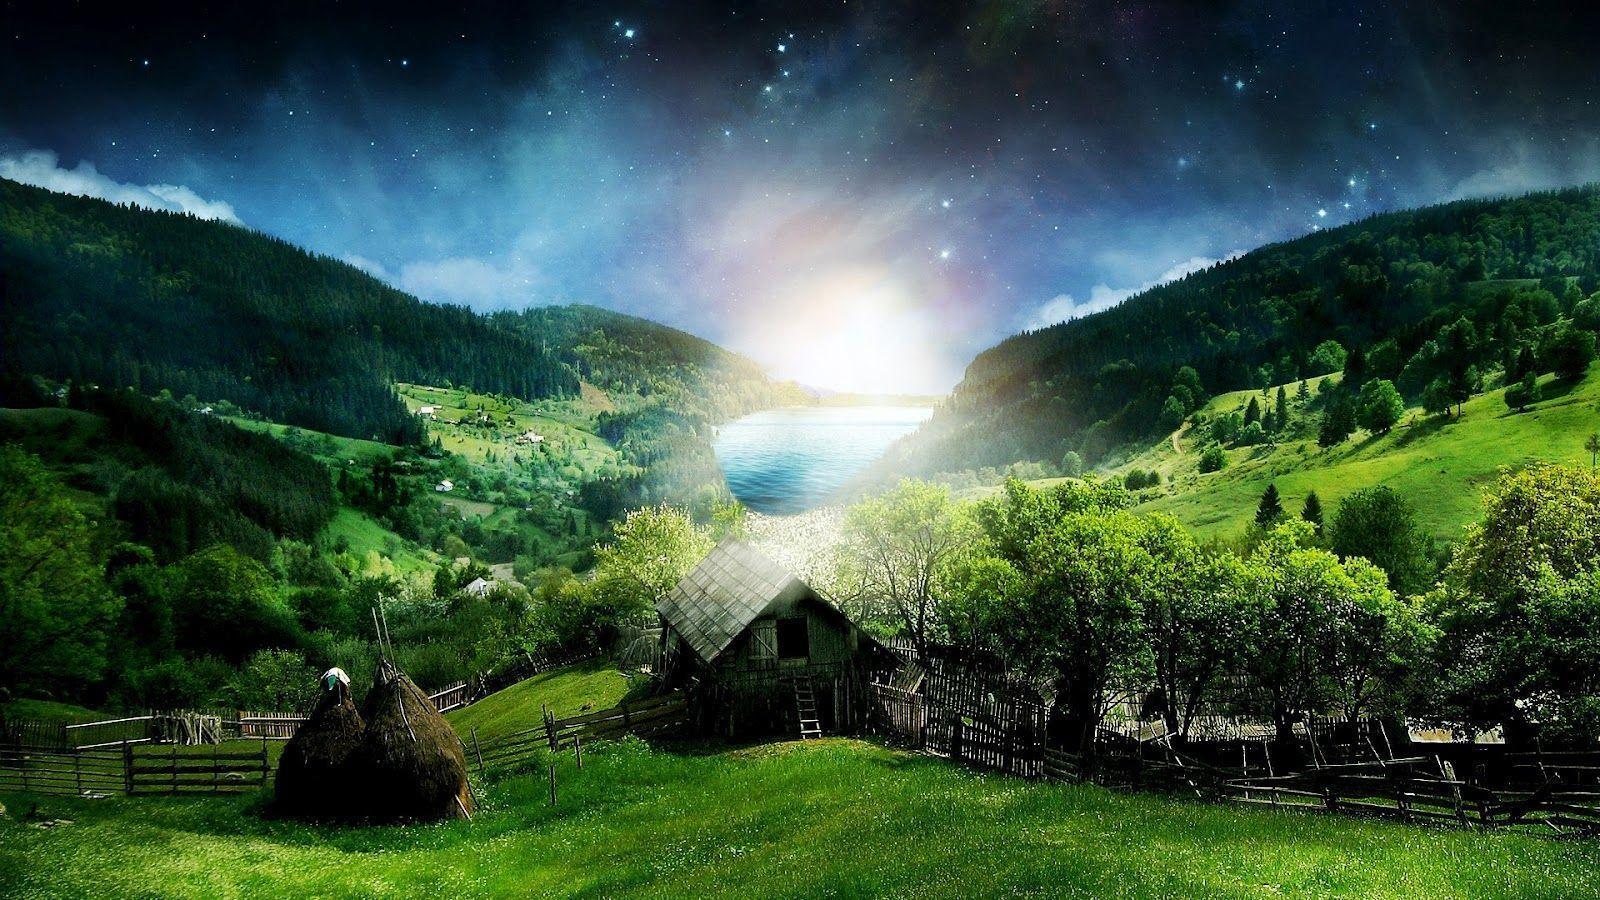 Hd wallpaper download for laptop - Best Hd Nature Wallpaper For Laptop Hd Background 9 Hd Wallpapers Download